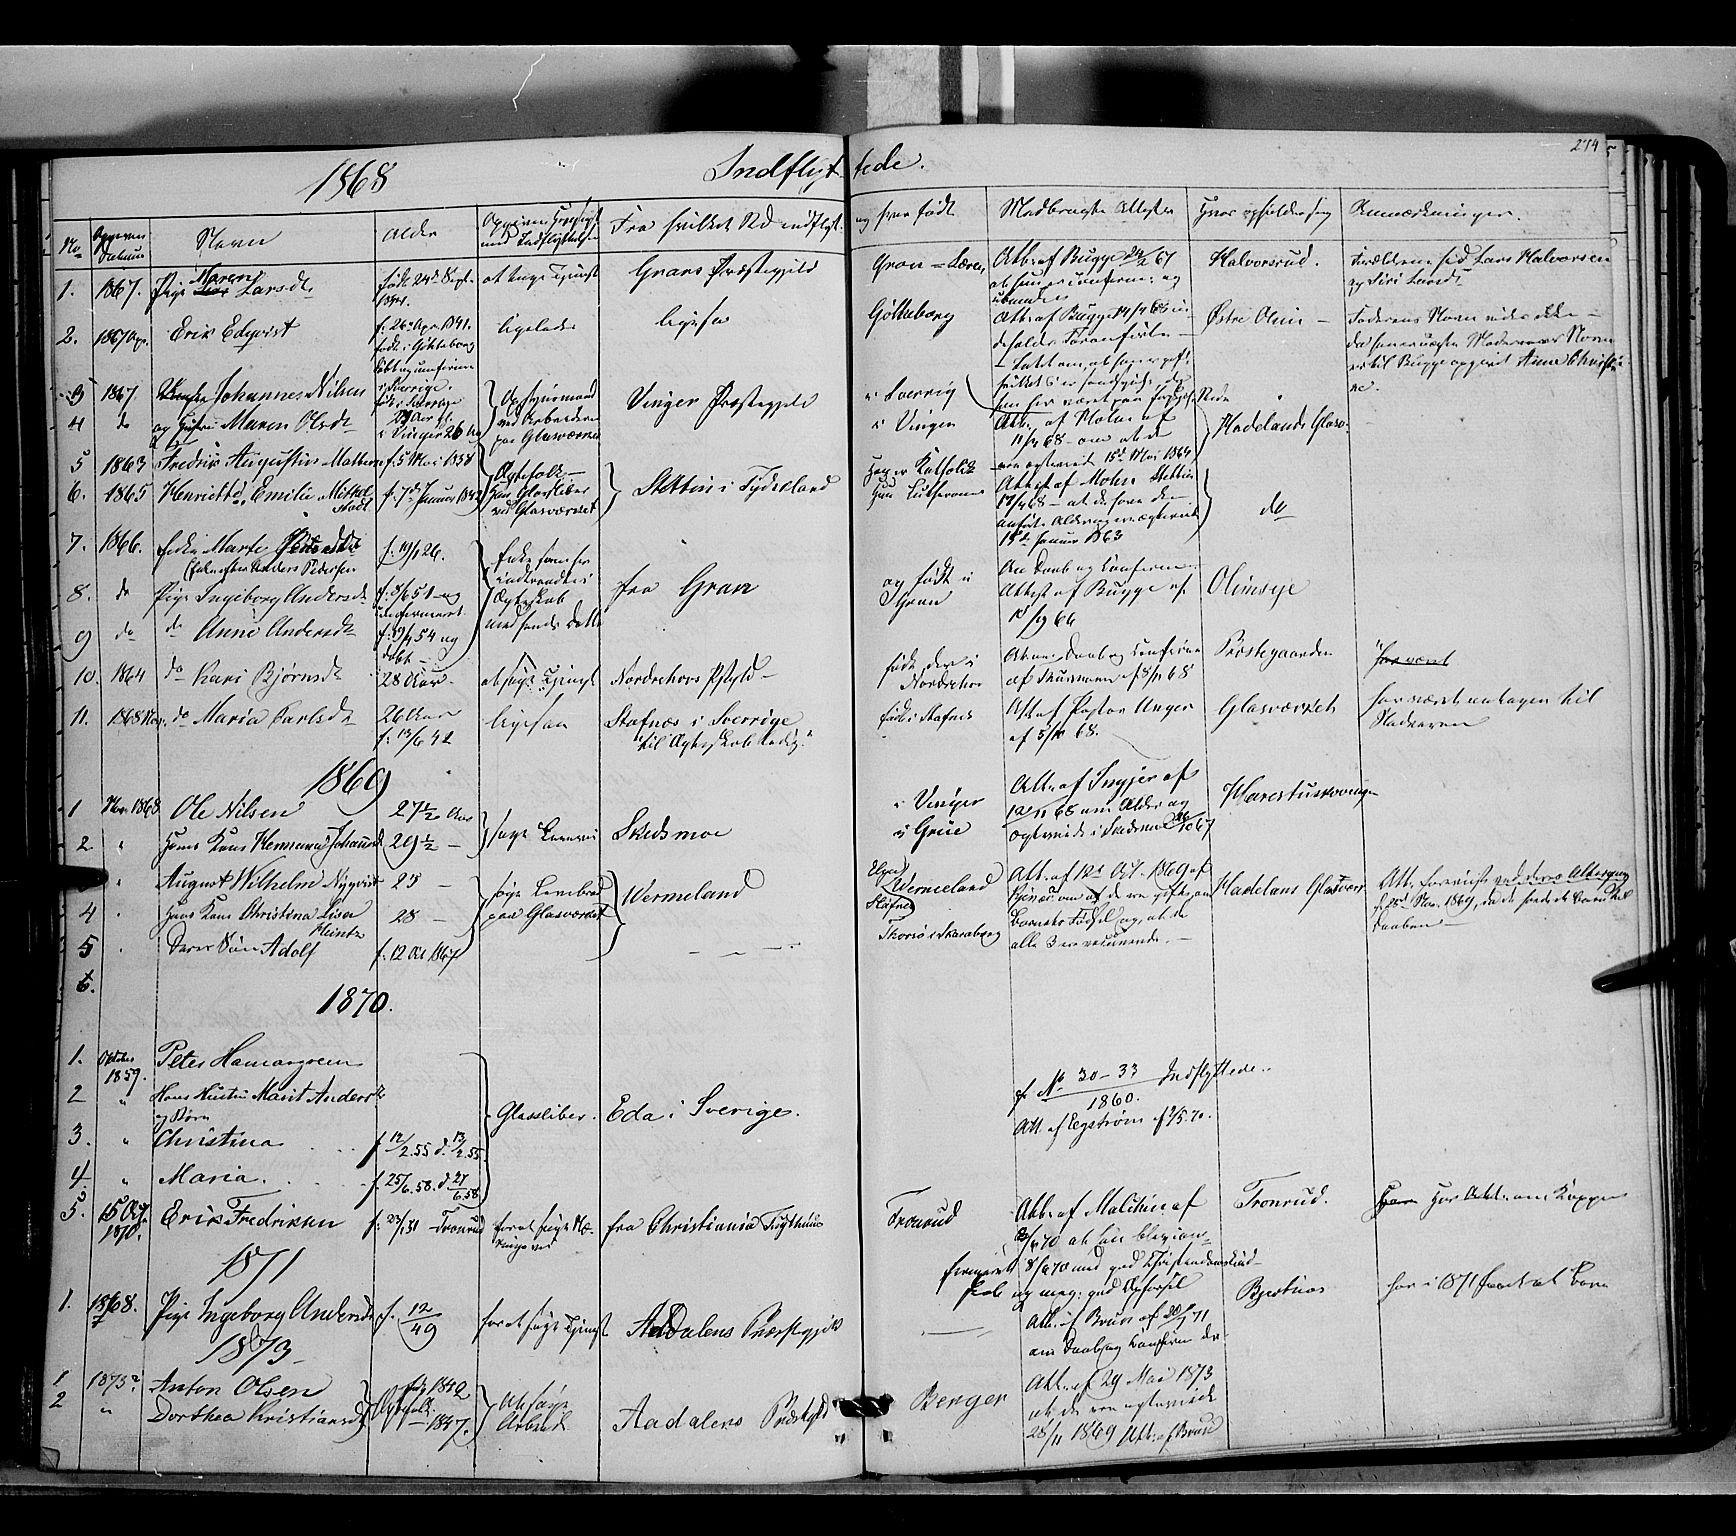 SAH, Jevnaker prestekontor, Ministerialbok nr. 7, 1858-1876, s. 274